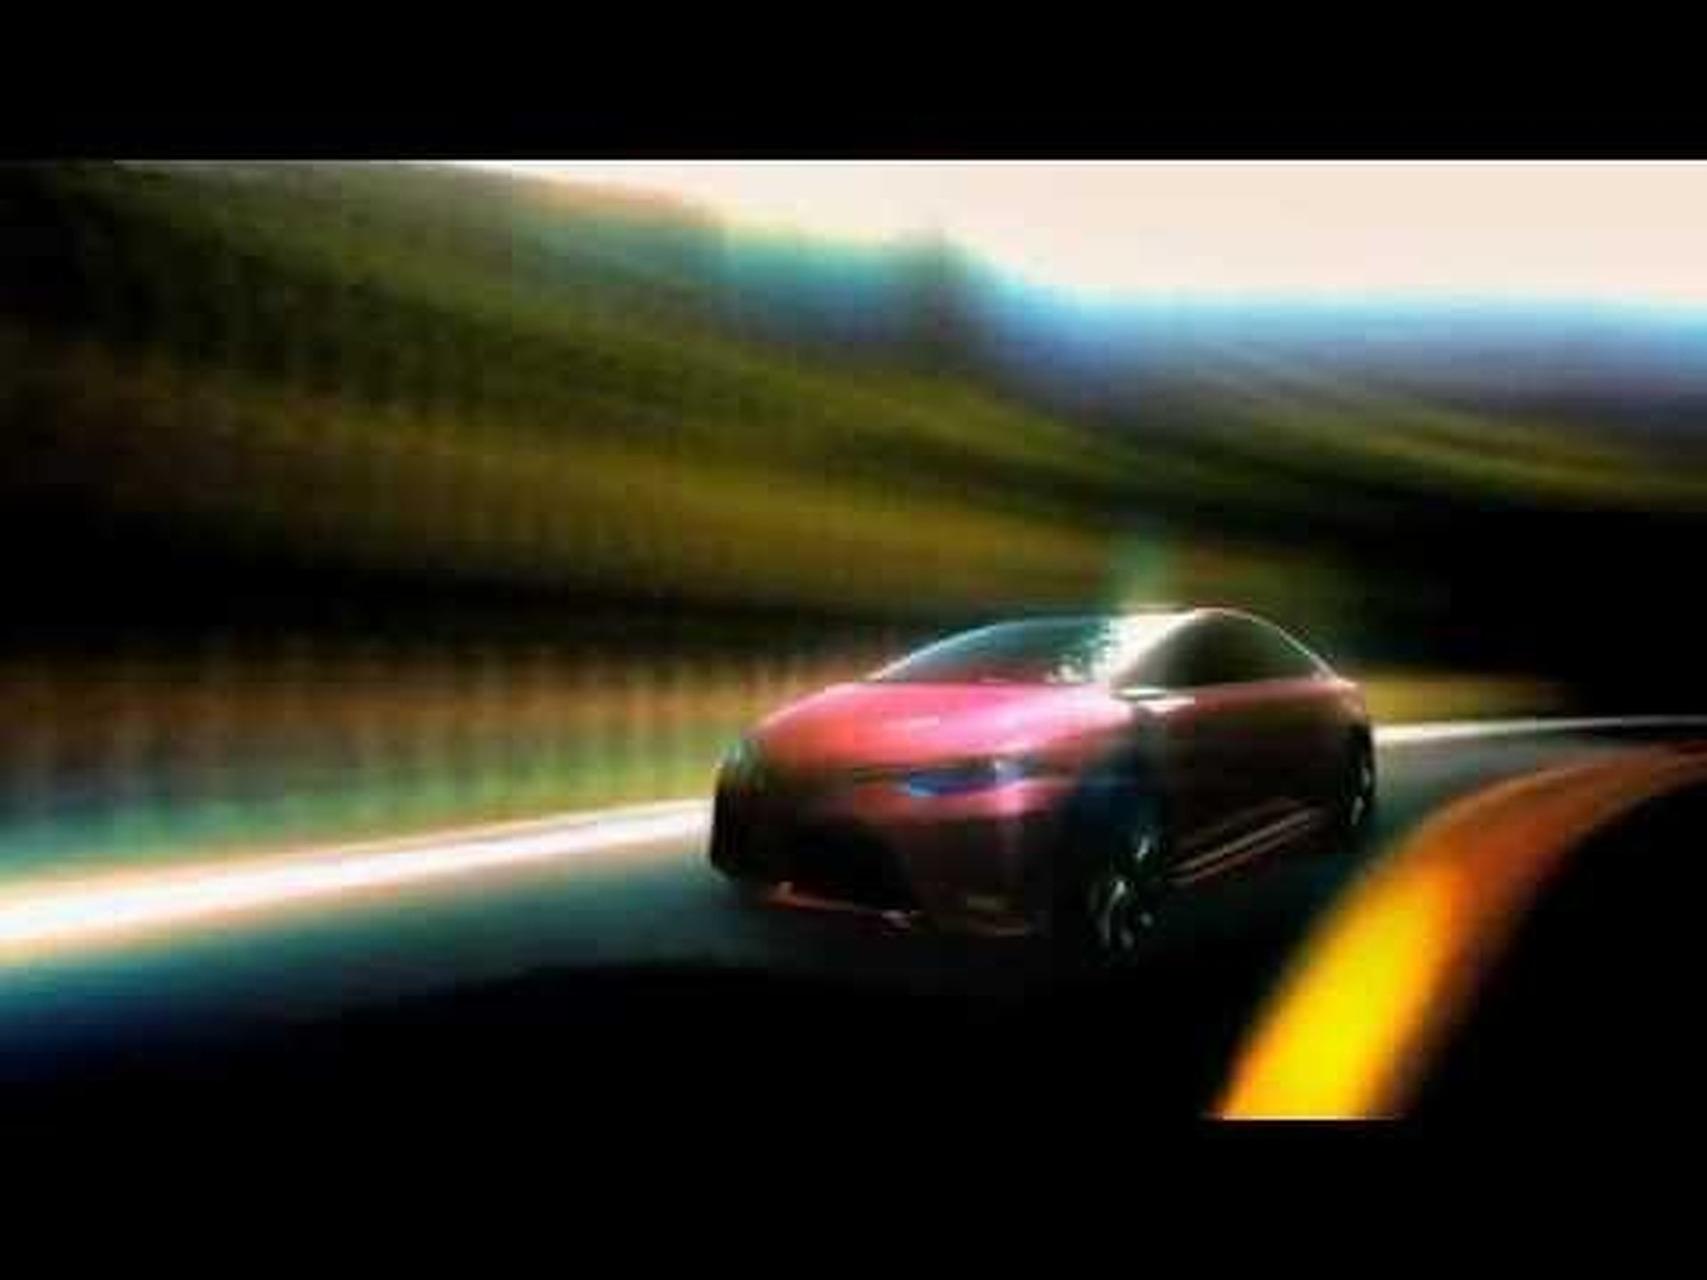 2012 Toyota NS4 Advanced Plug-in Hybrid Concept Design